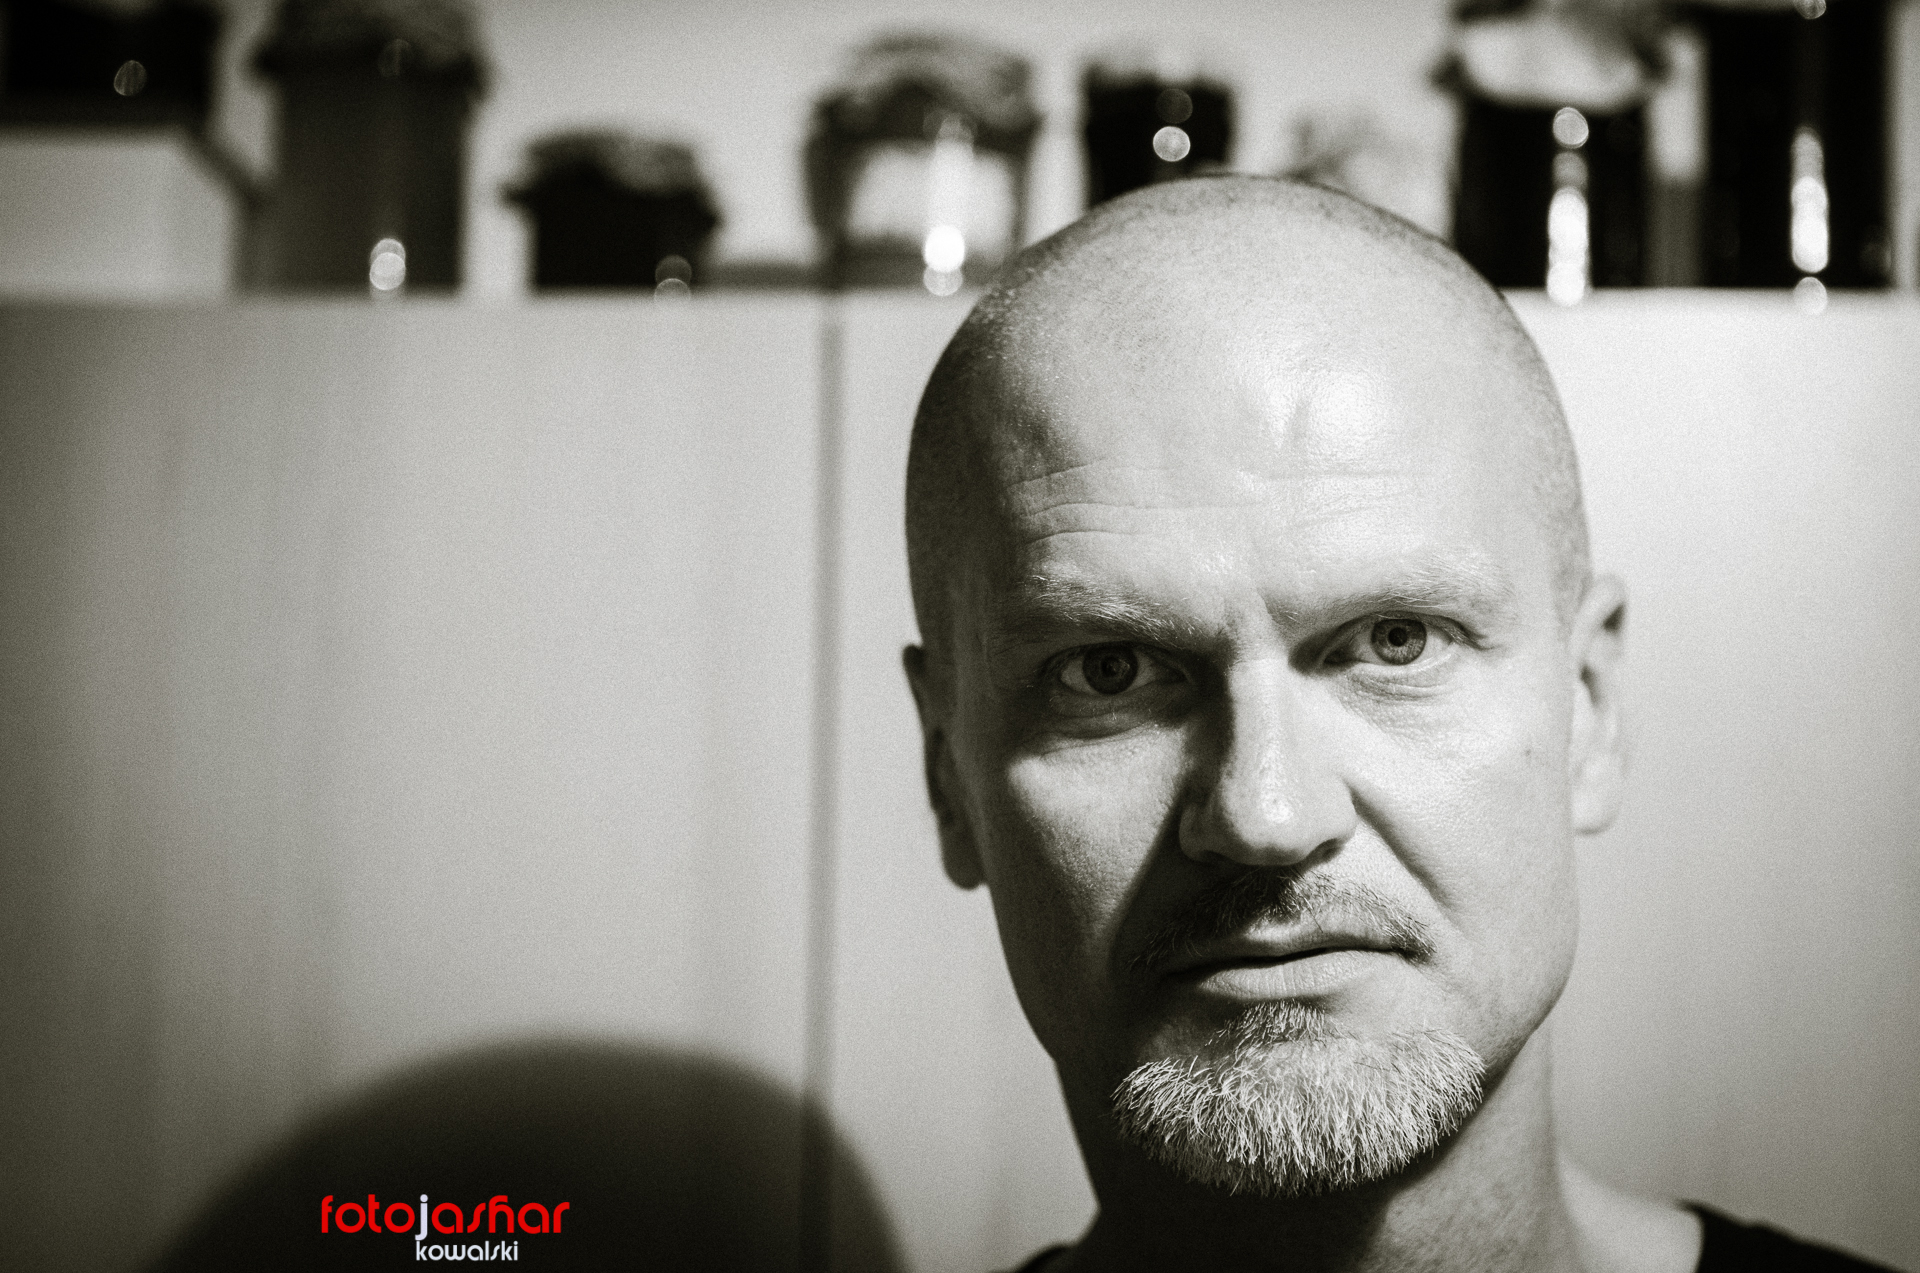 Damir Avdić : Imam 51, nisam ni reakcionar ni cinik